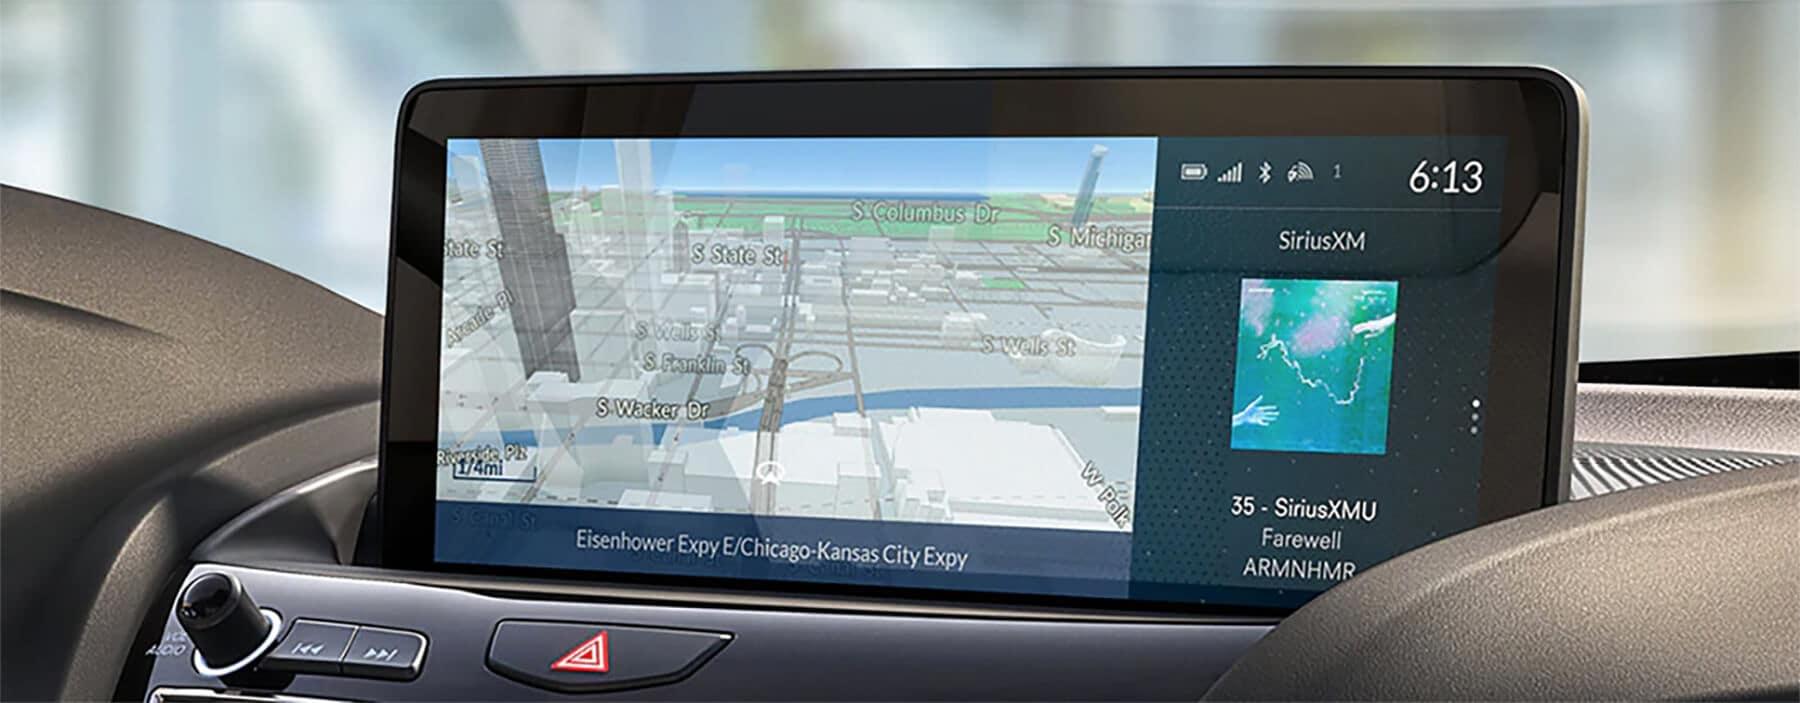 Acura Navigation System Slider